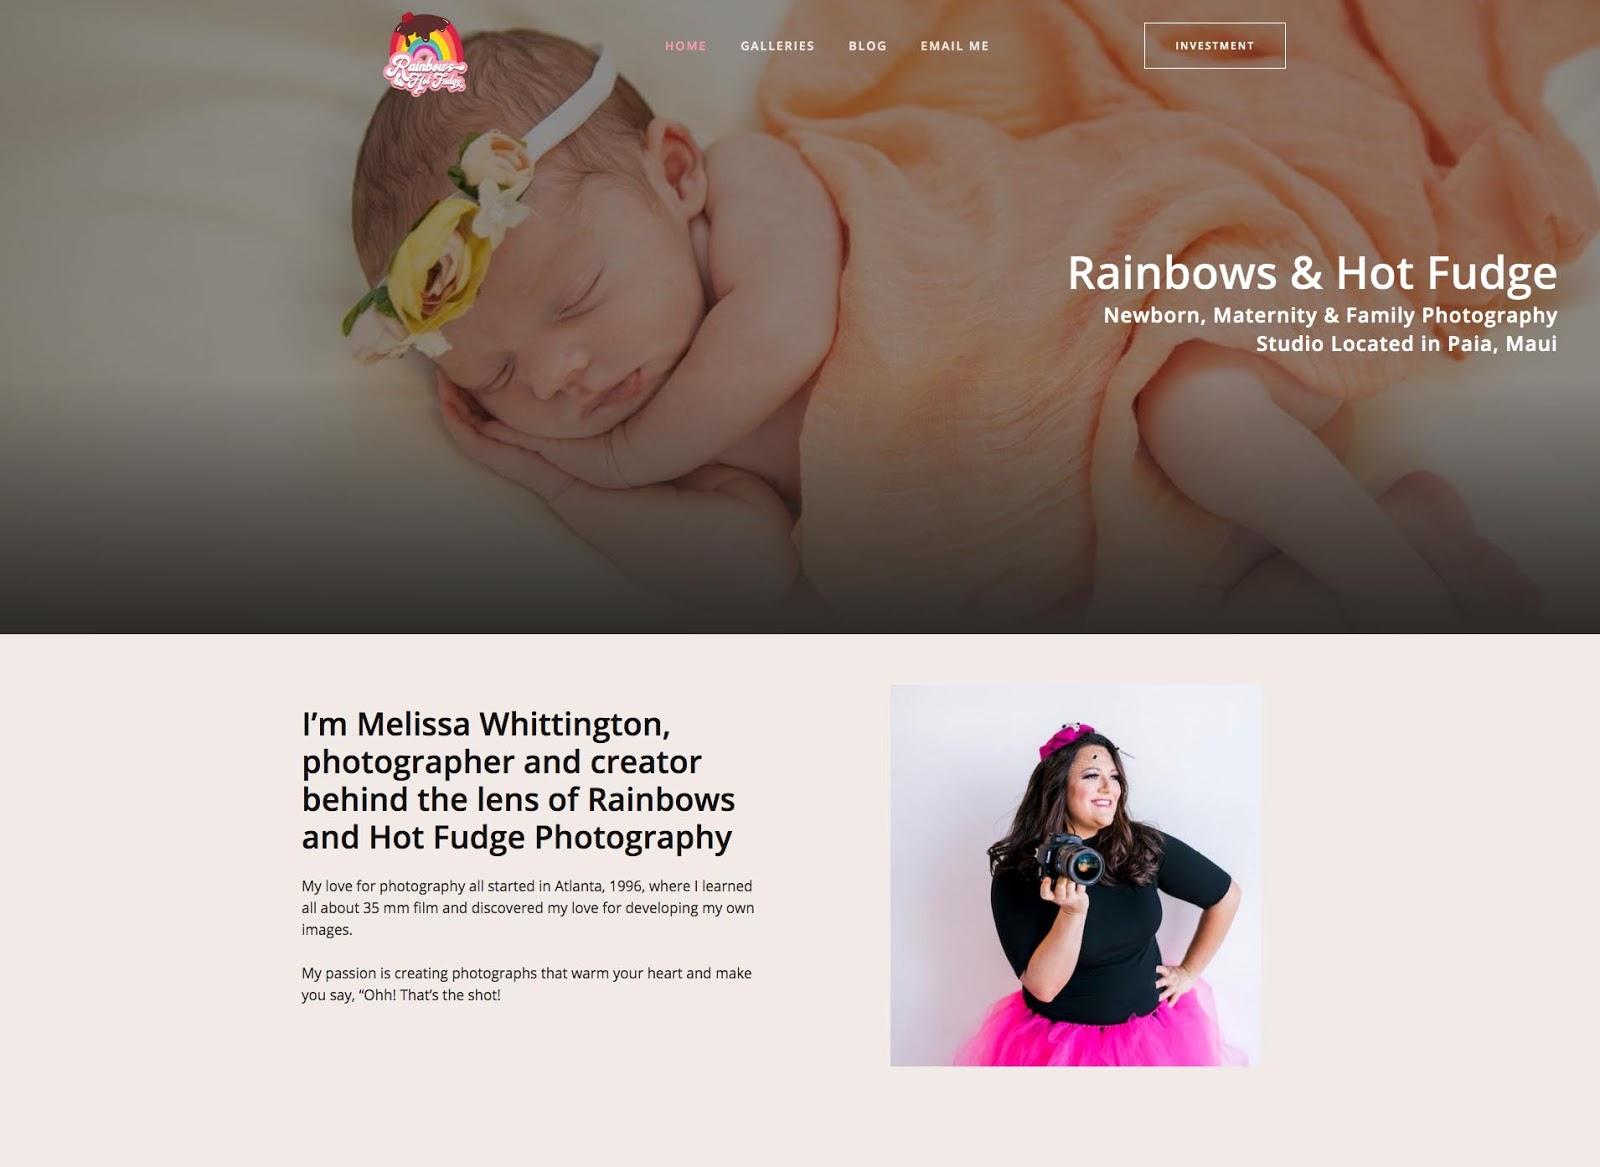 Photographer Melissa Whittington's website, Rainbows & Hot Fudge.